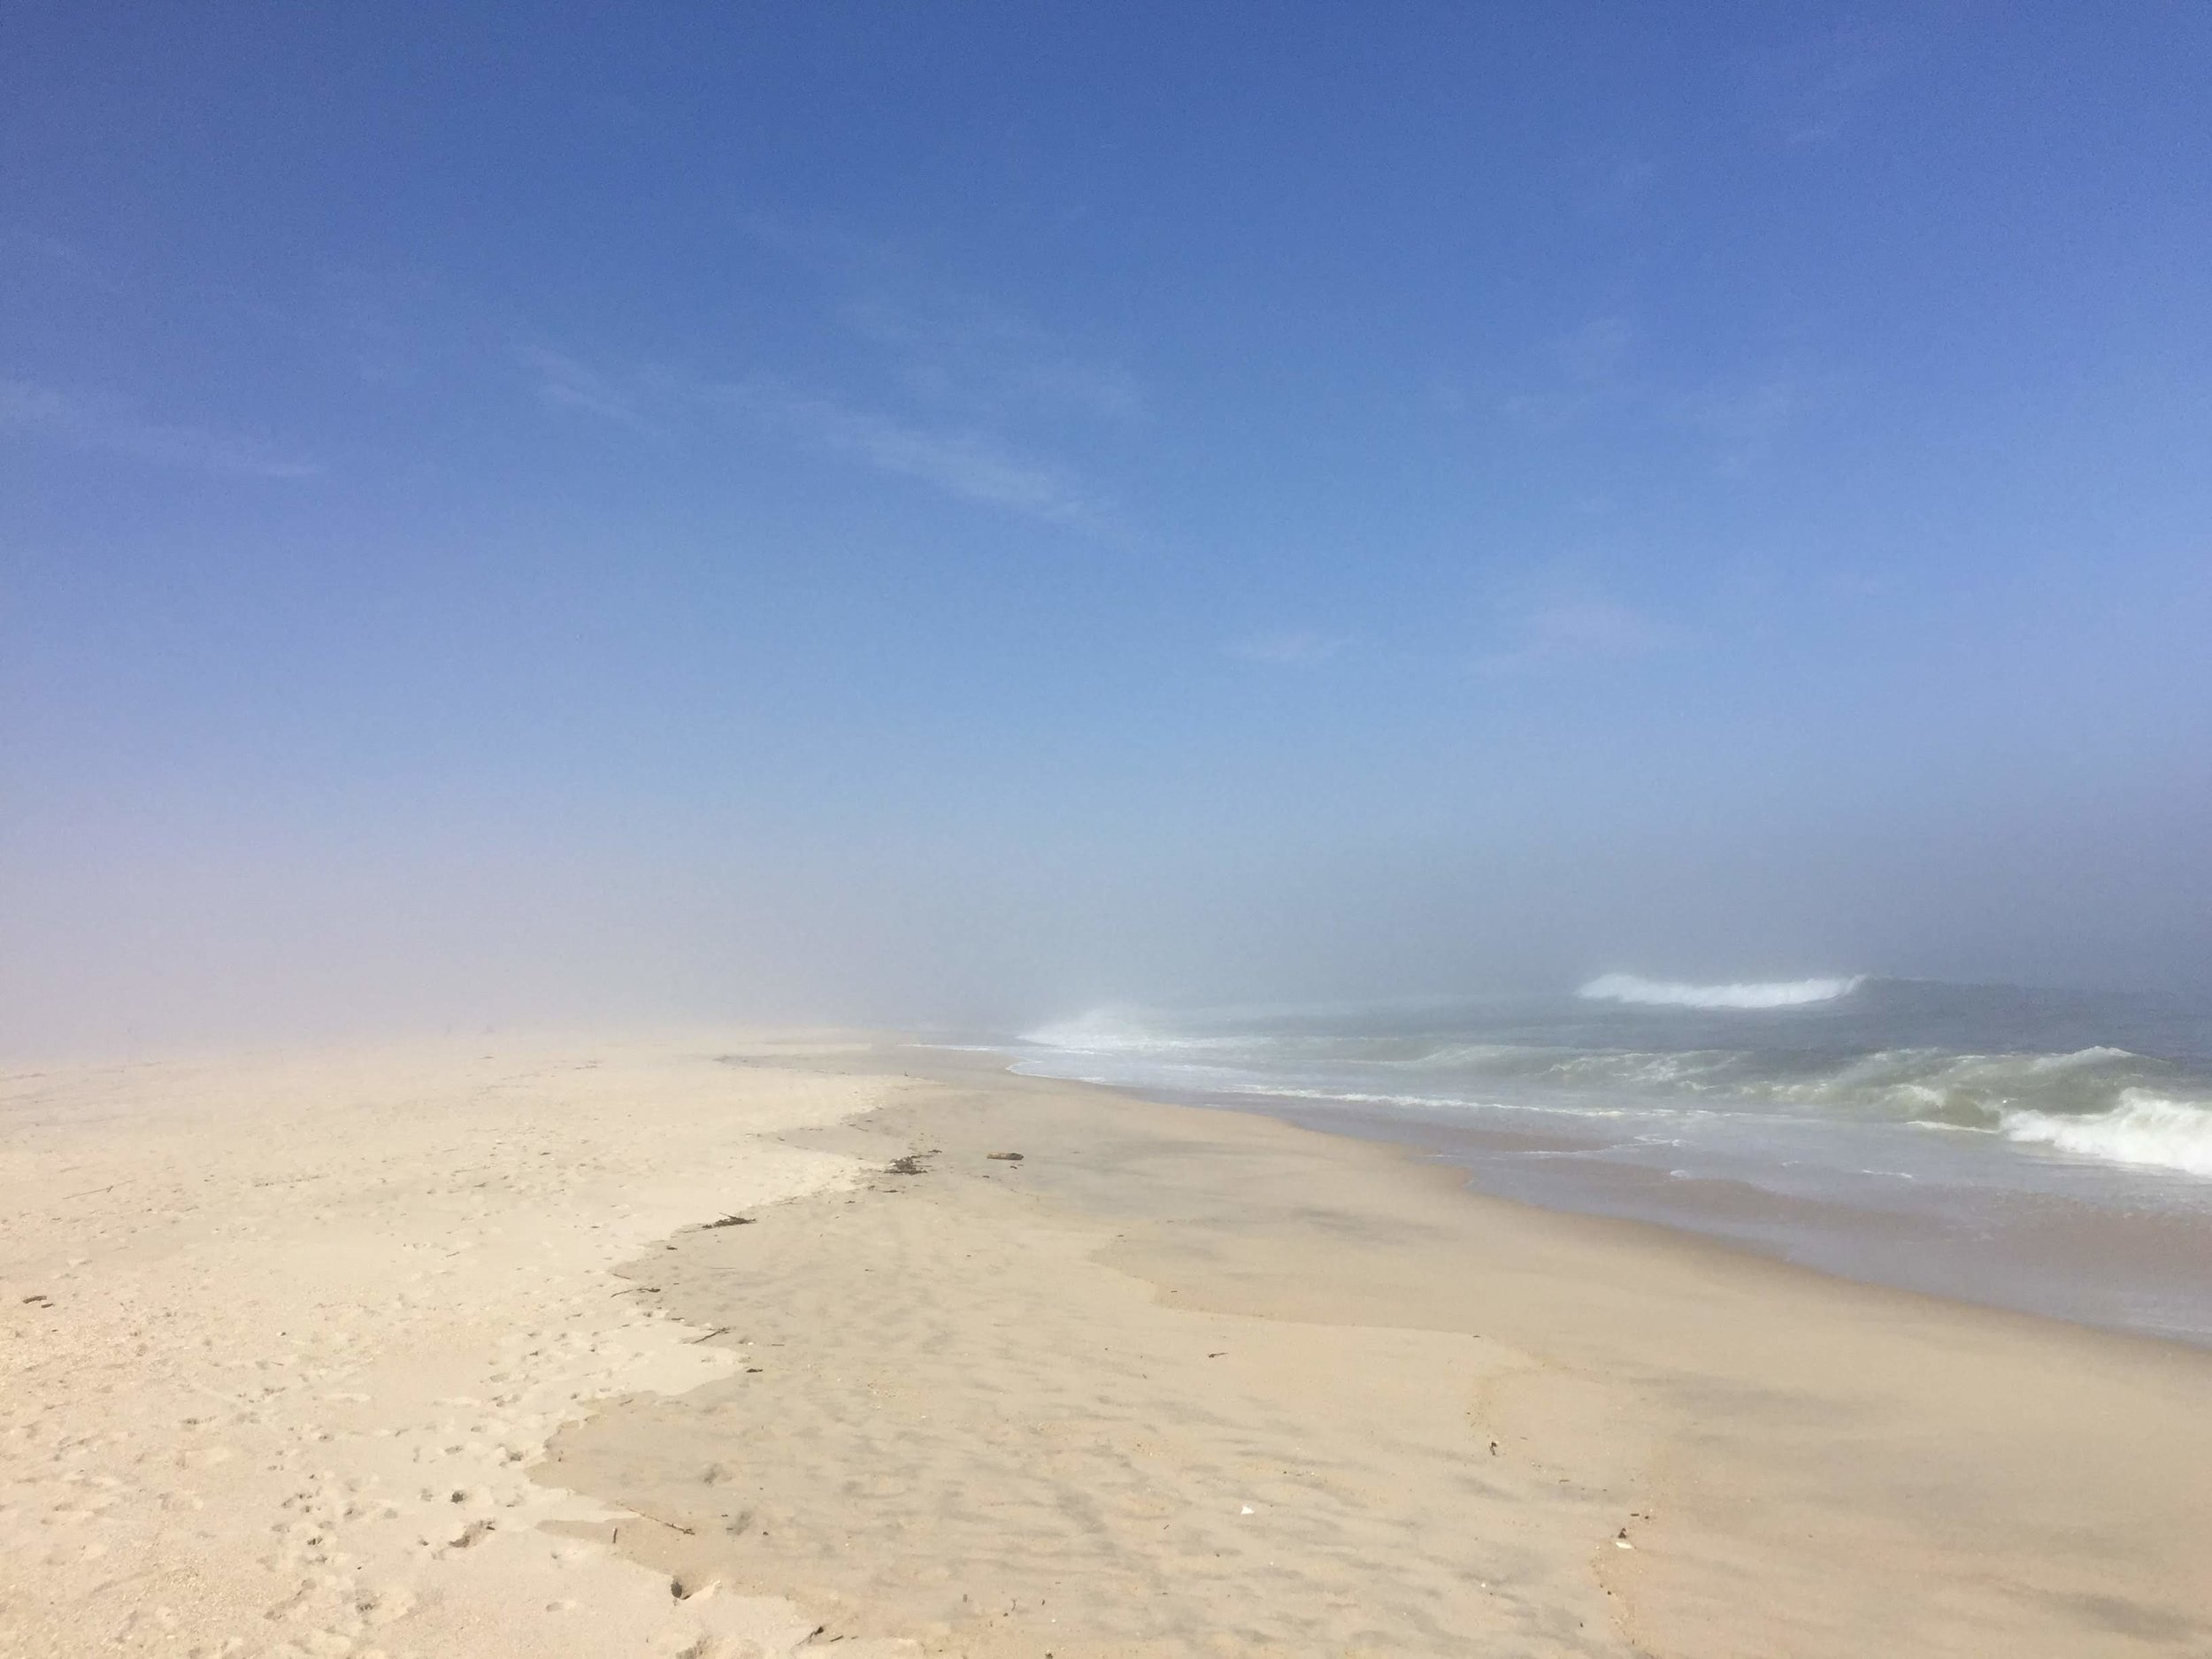 amy_chen_design_sandy_hook_beach_clean_fog.JPG